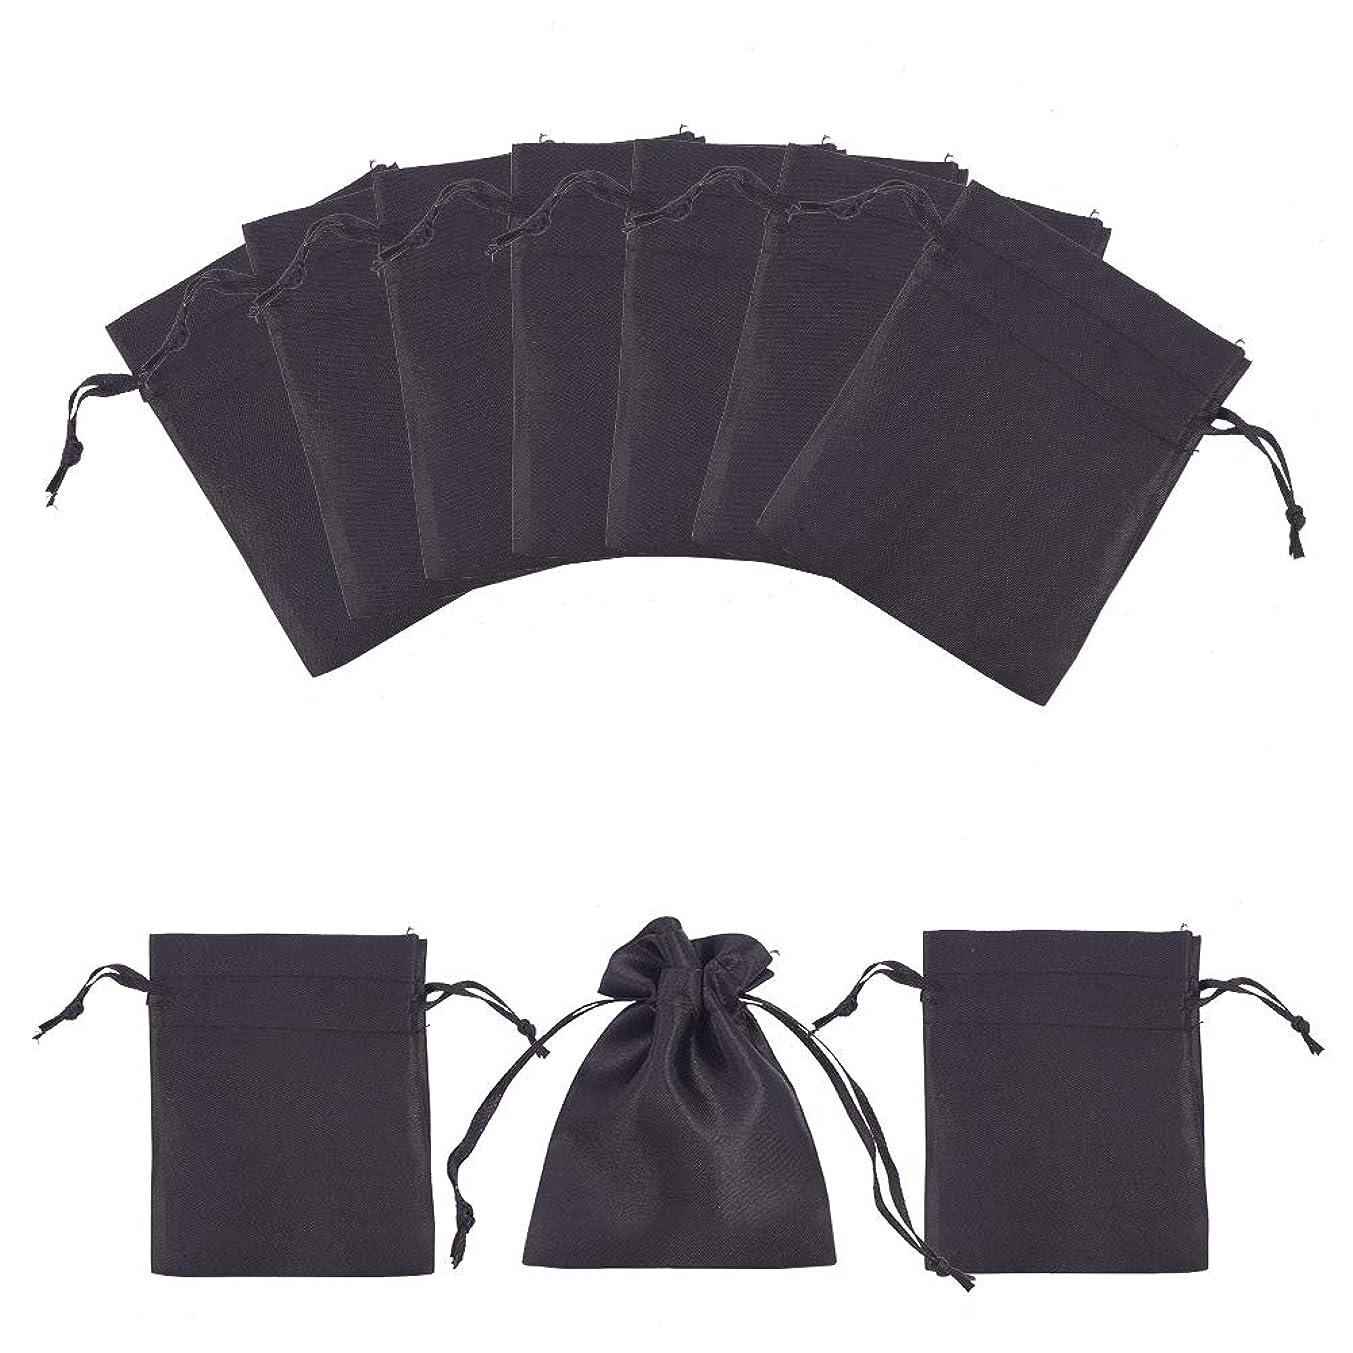 "PH PandaHall 50pcs Black Satin Gift Bag Drawstring Pouch Bags Wedding Favors Bridal Shower Candy Jewelry Bags, 3""x 4"""